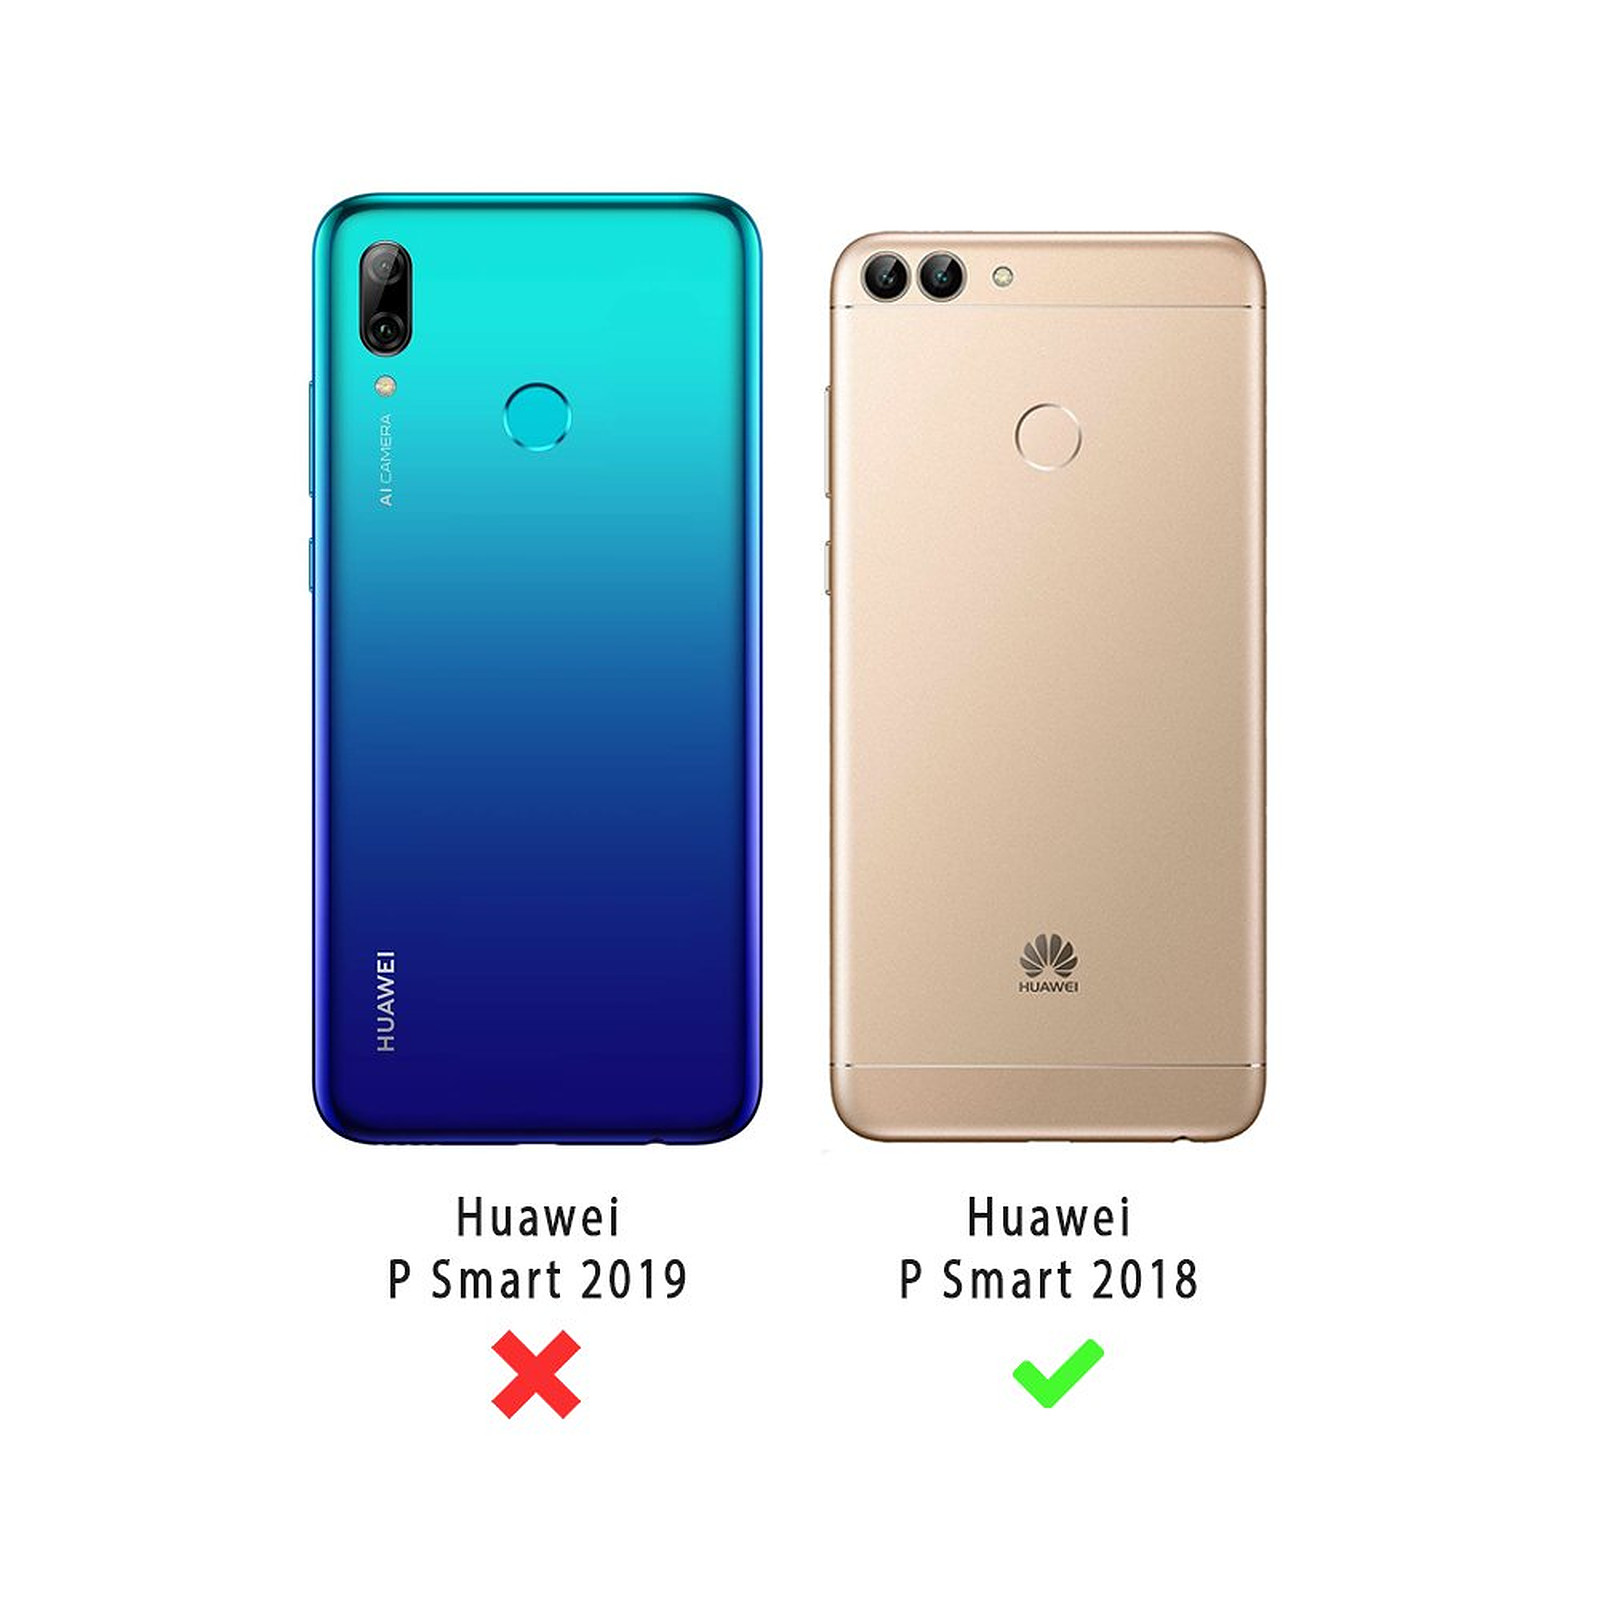 LA COQUE FRANCAISE Coque Huawei P Smart 2018 souple transparente TrioCo